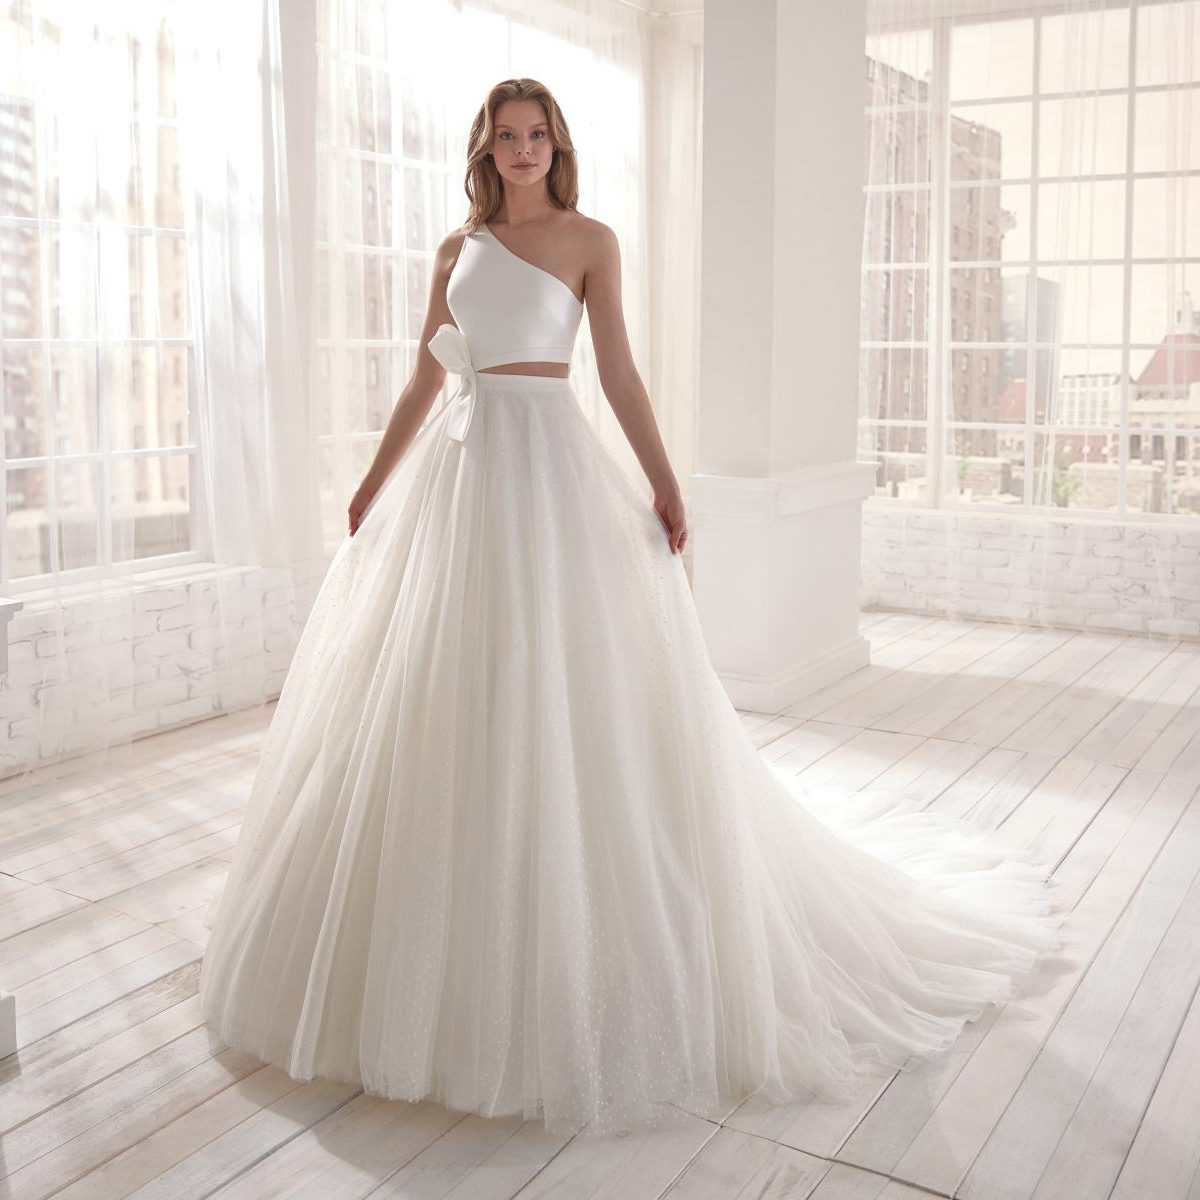 Elizabeth-Bridal-Jolies-20561